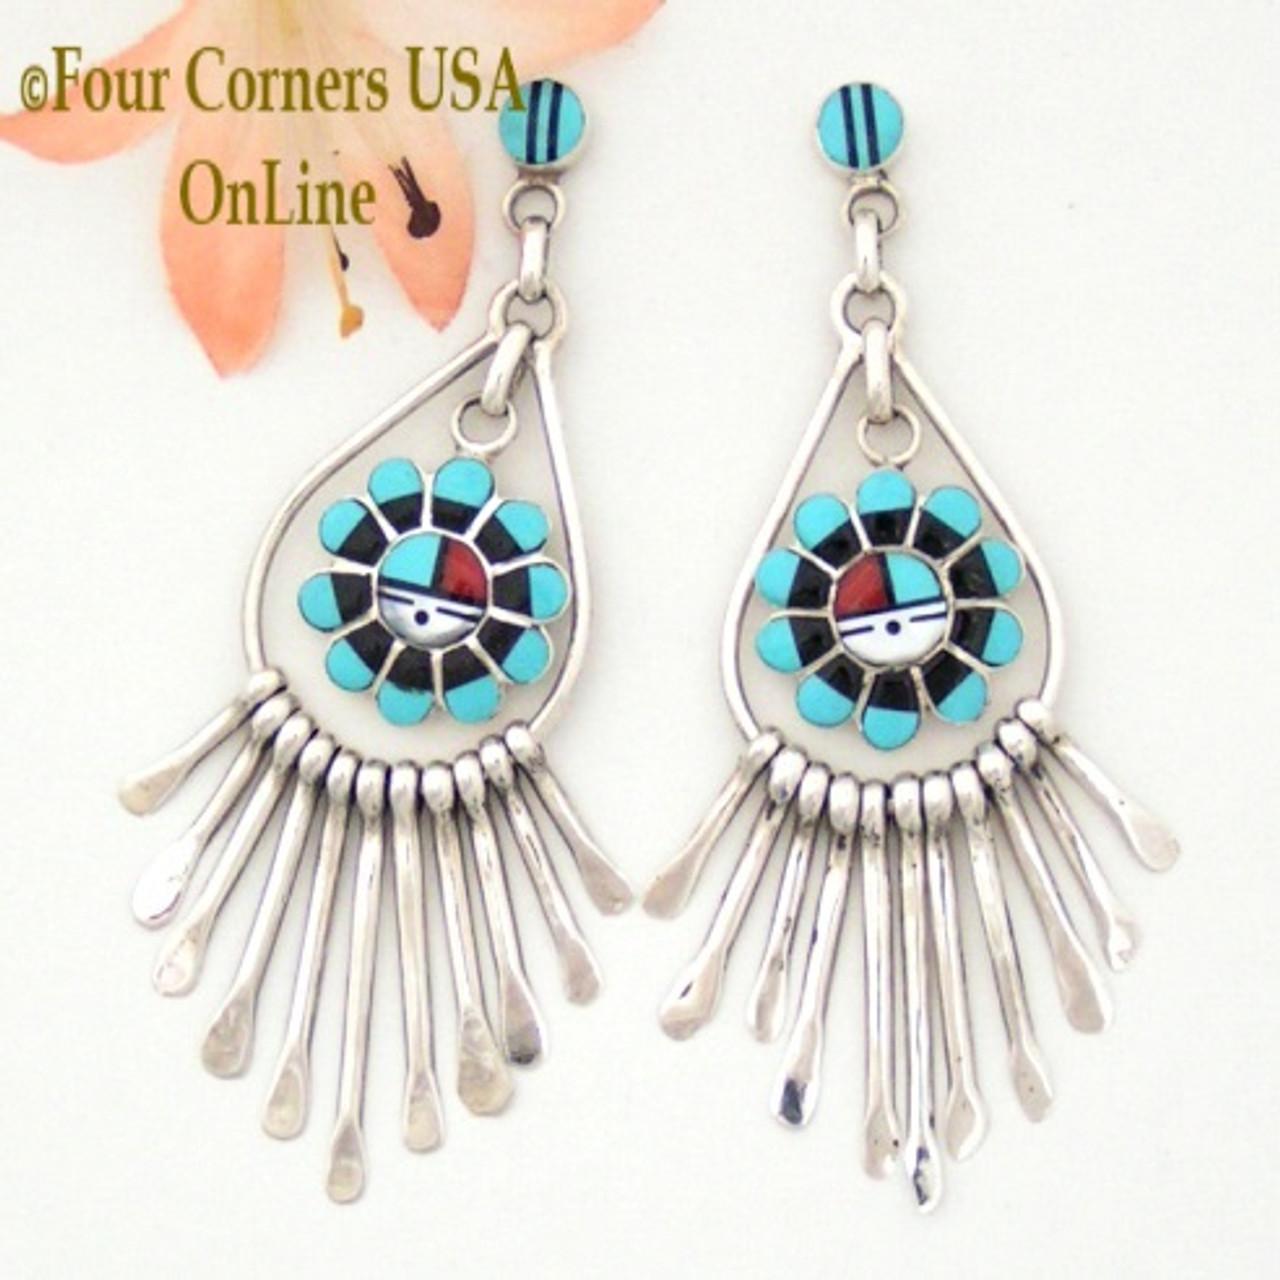 Unkestine Zuni Indian Jewelry Sterling Silver Turquoise Post Dangle Earrings